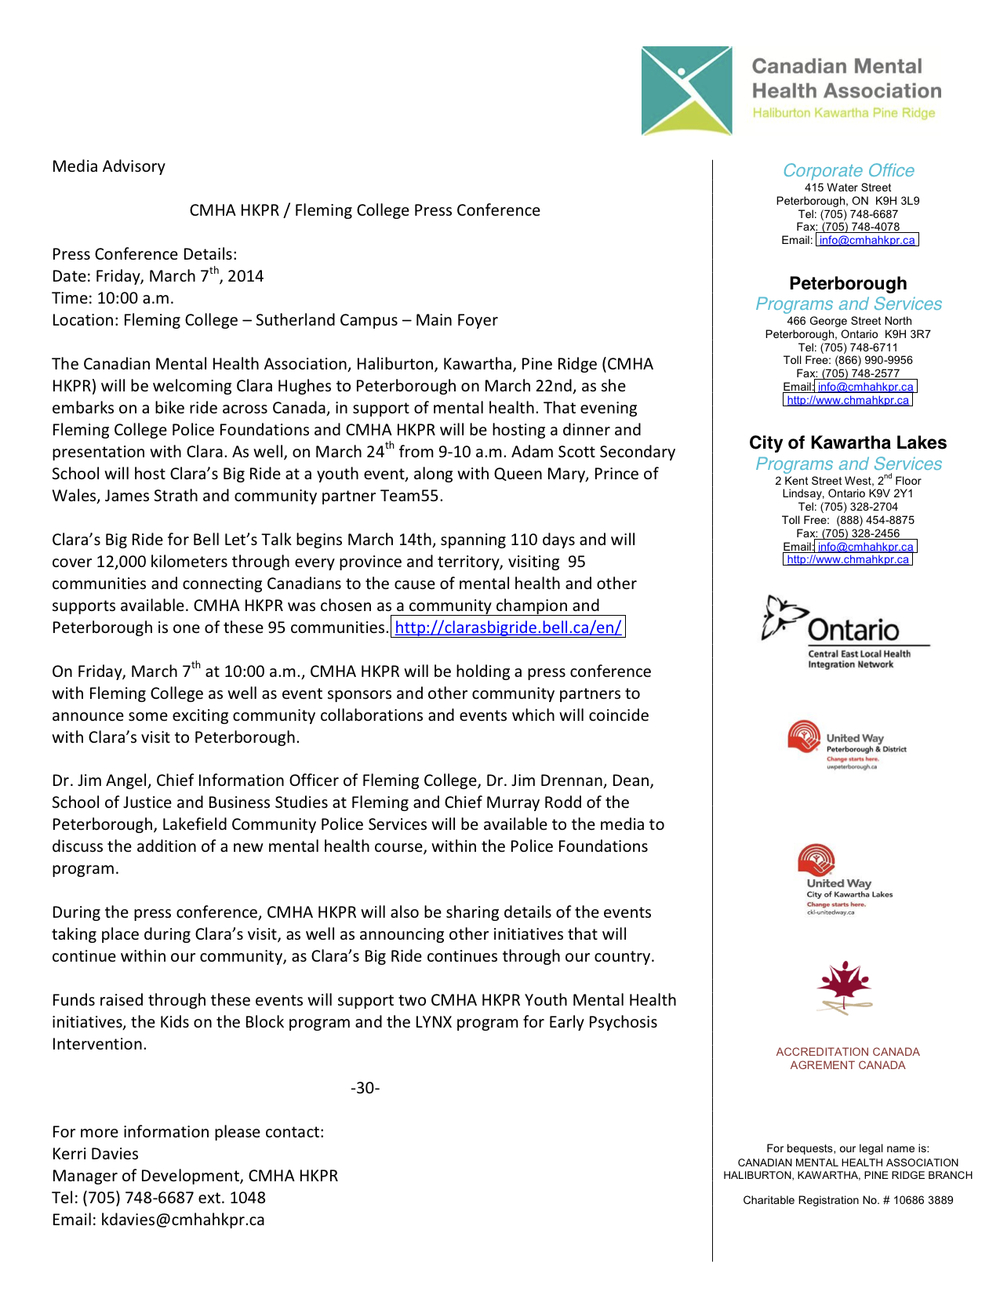 CMHA's press release.